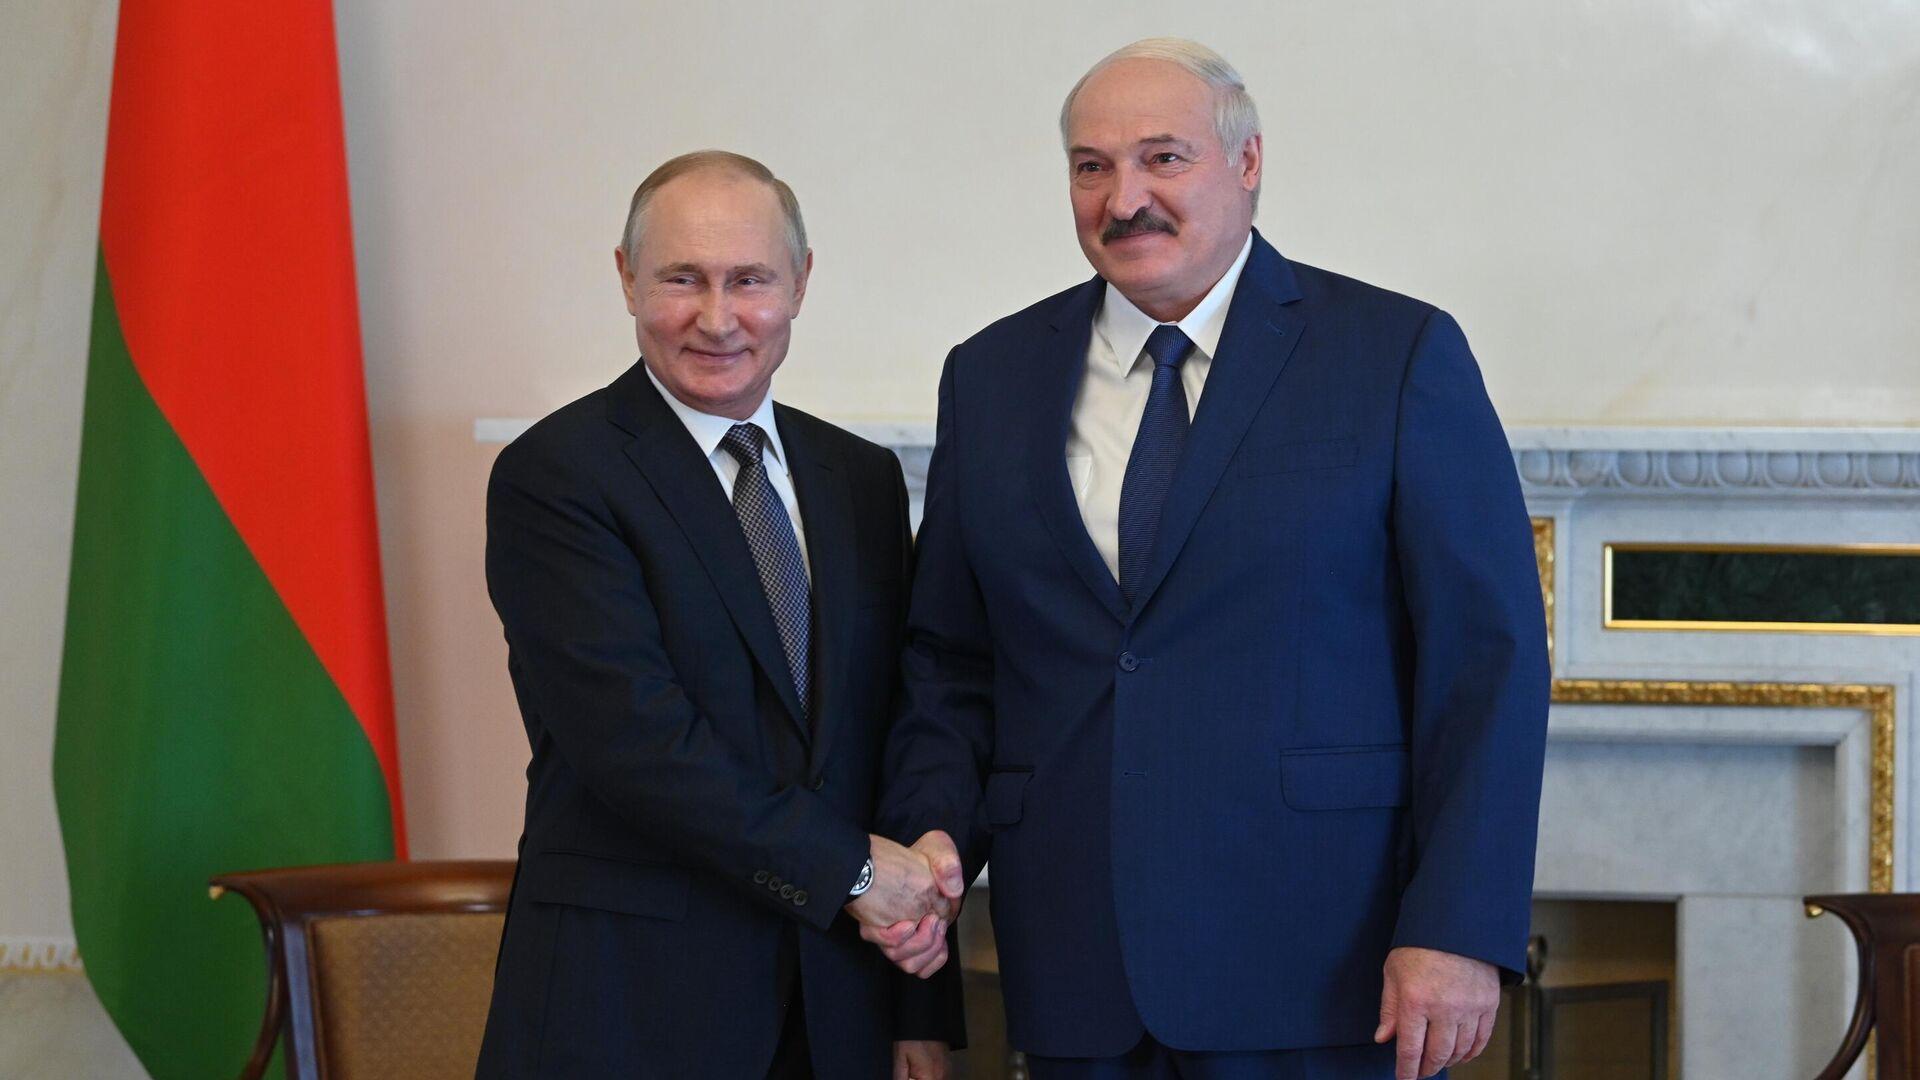 Президент РФ Владимир Путин и президент Белоруссии Александр Лукашенко во время встречи - РИА Новости, 1920, 15.07.2021